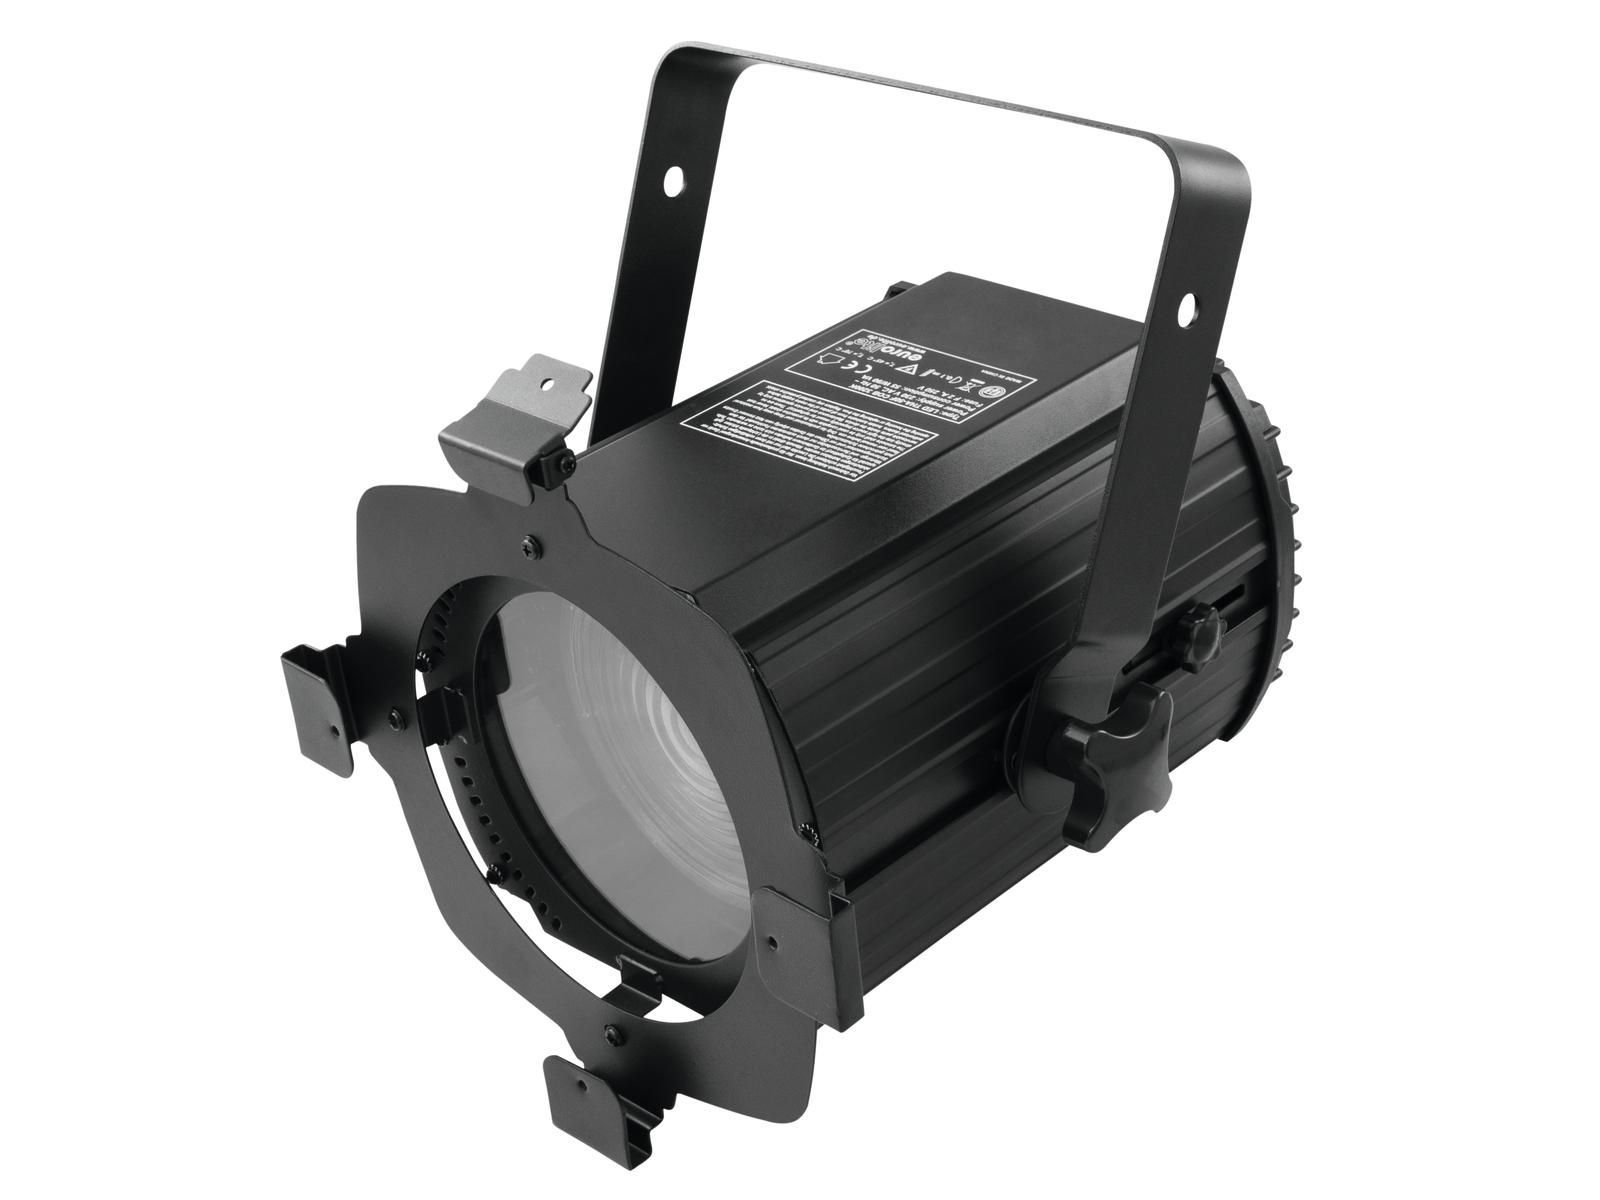 EUROLITE LED THA-50F COB 3200K LED Theaterscheinwerfer mit DMX